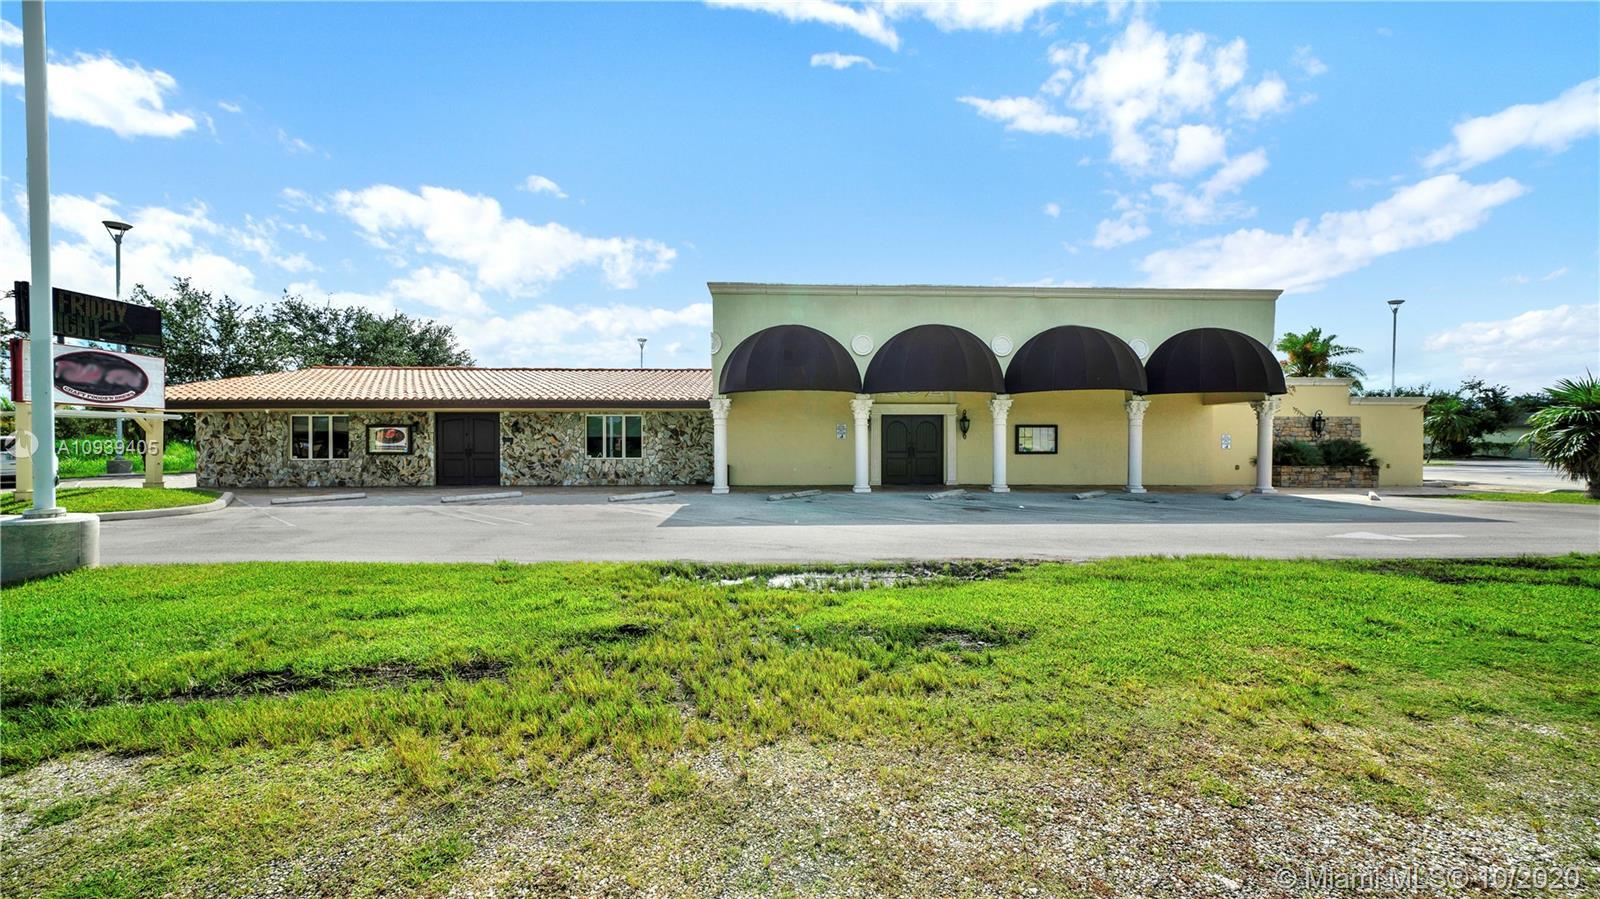 935 N Krome Ave Property Photo 1